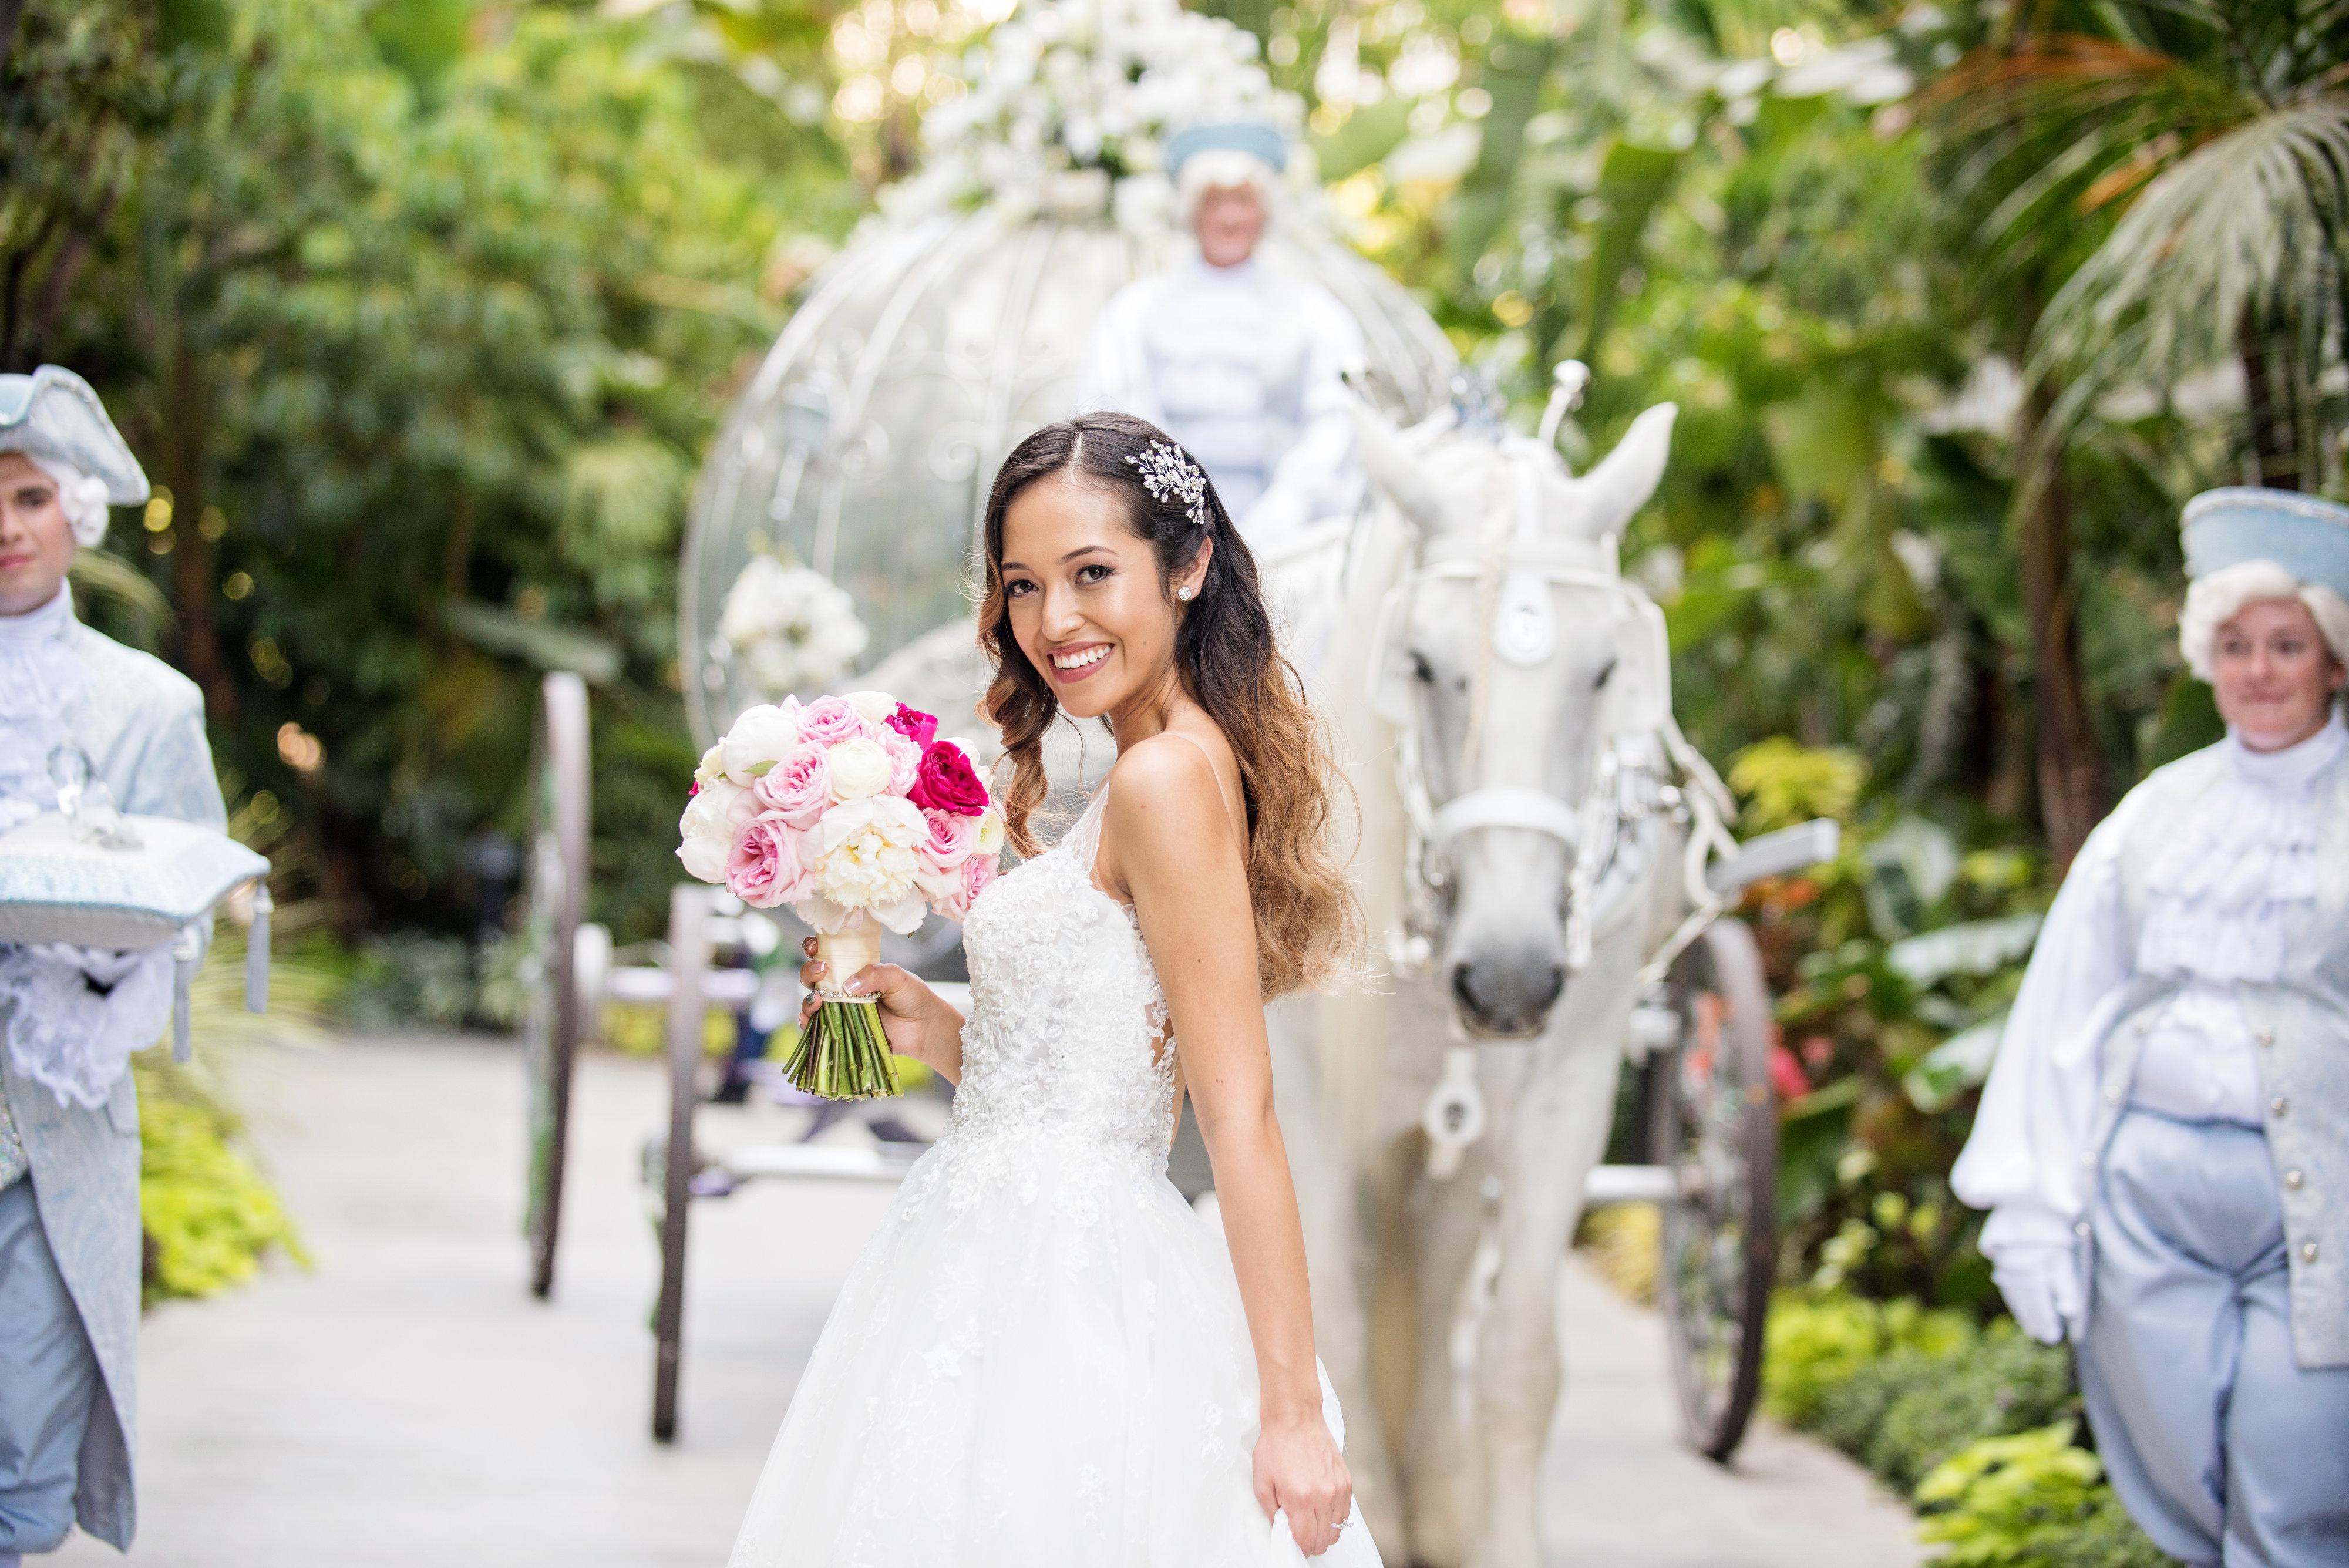 Columbian disney bride hair and makeup by Karissa Lorinne